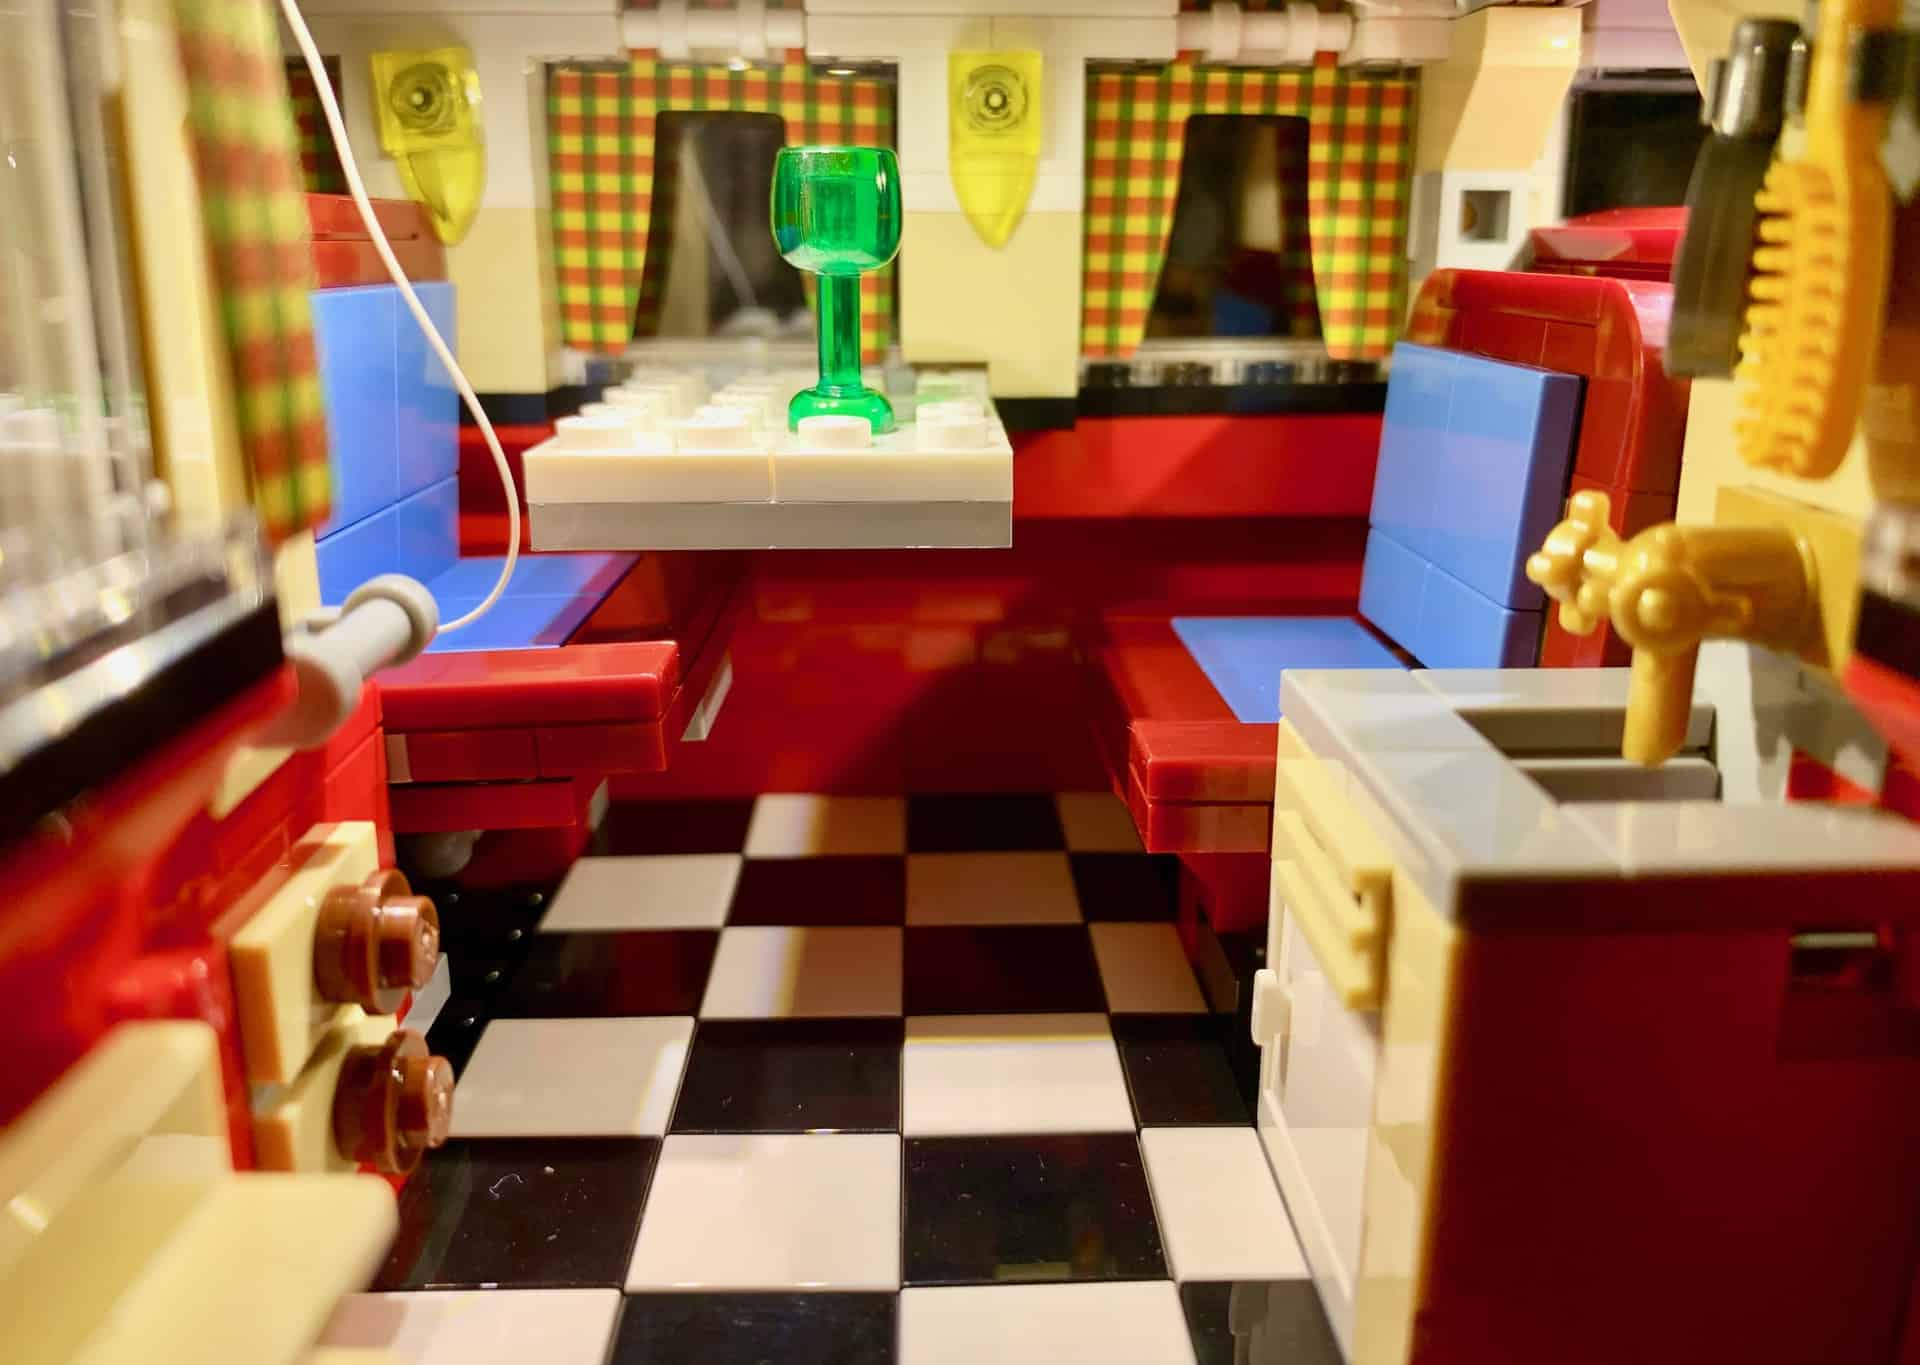 Wohnmobil_Innenraum_Lego-1